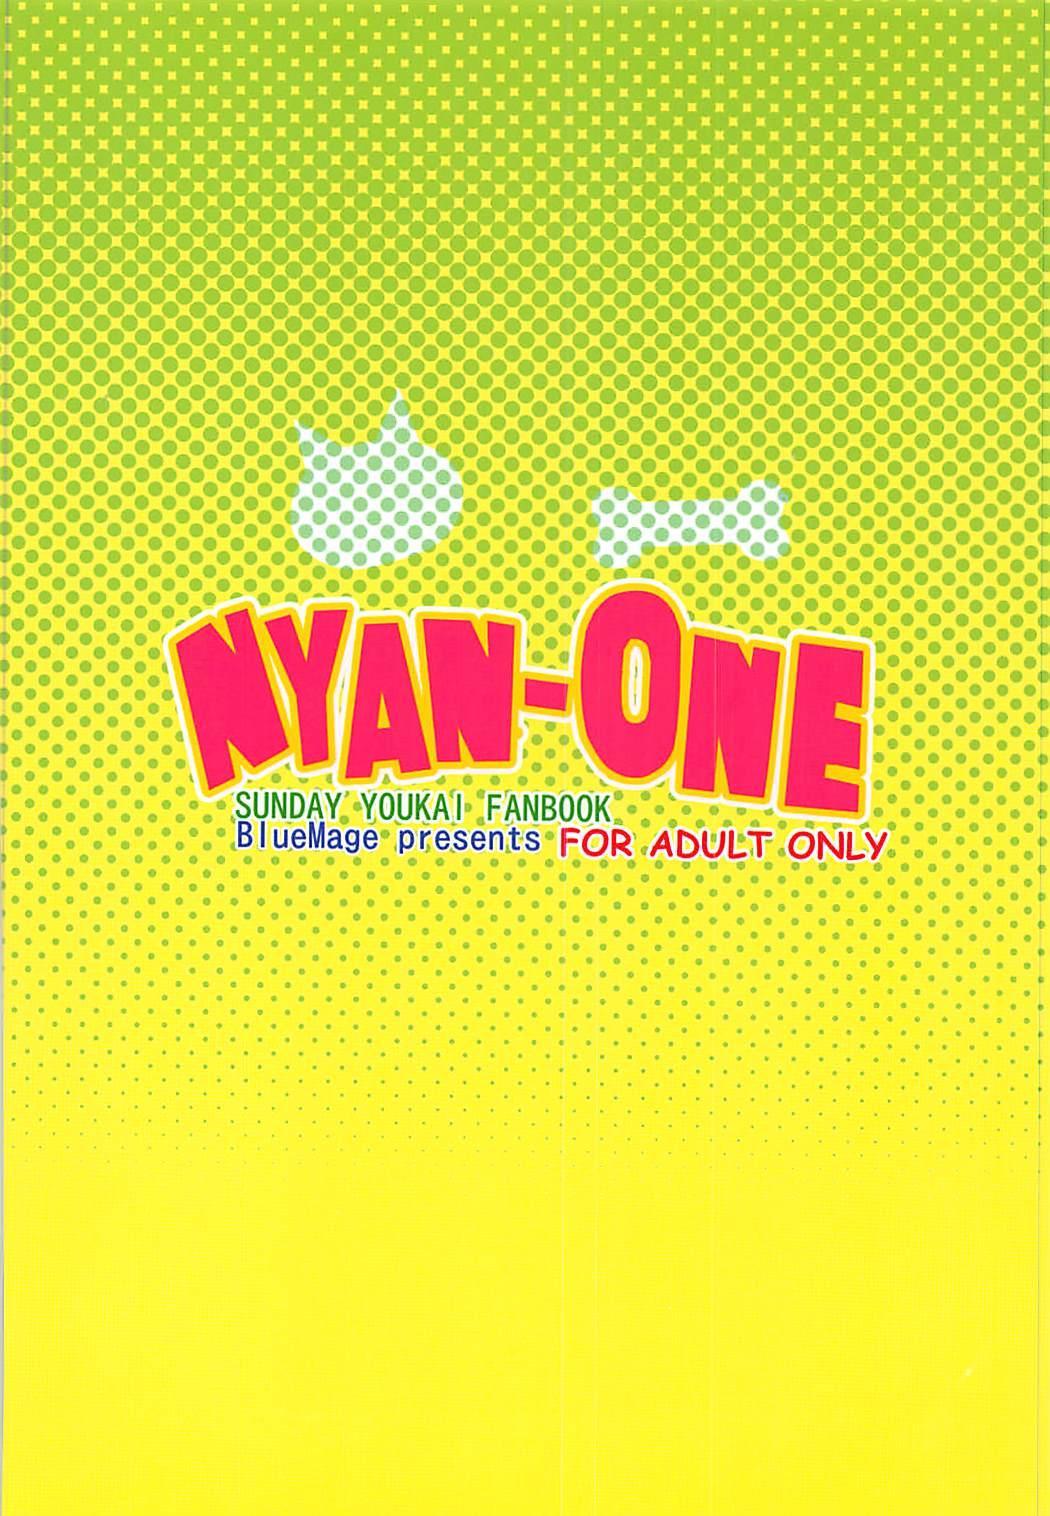 NYAN-ONE 17